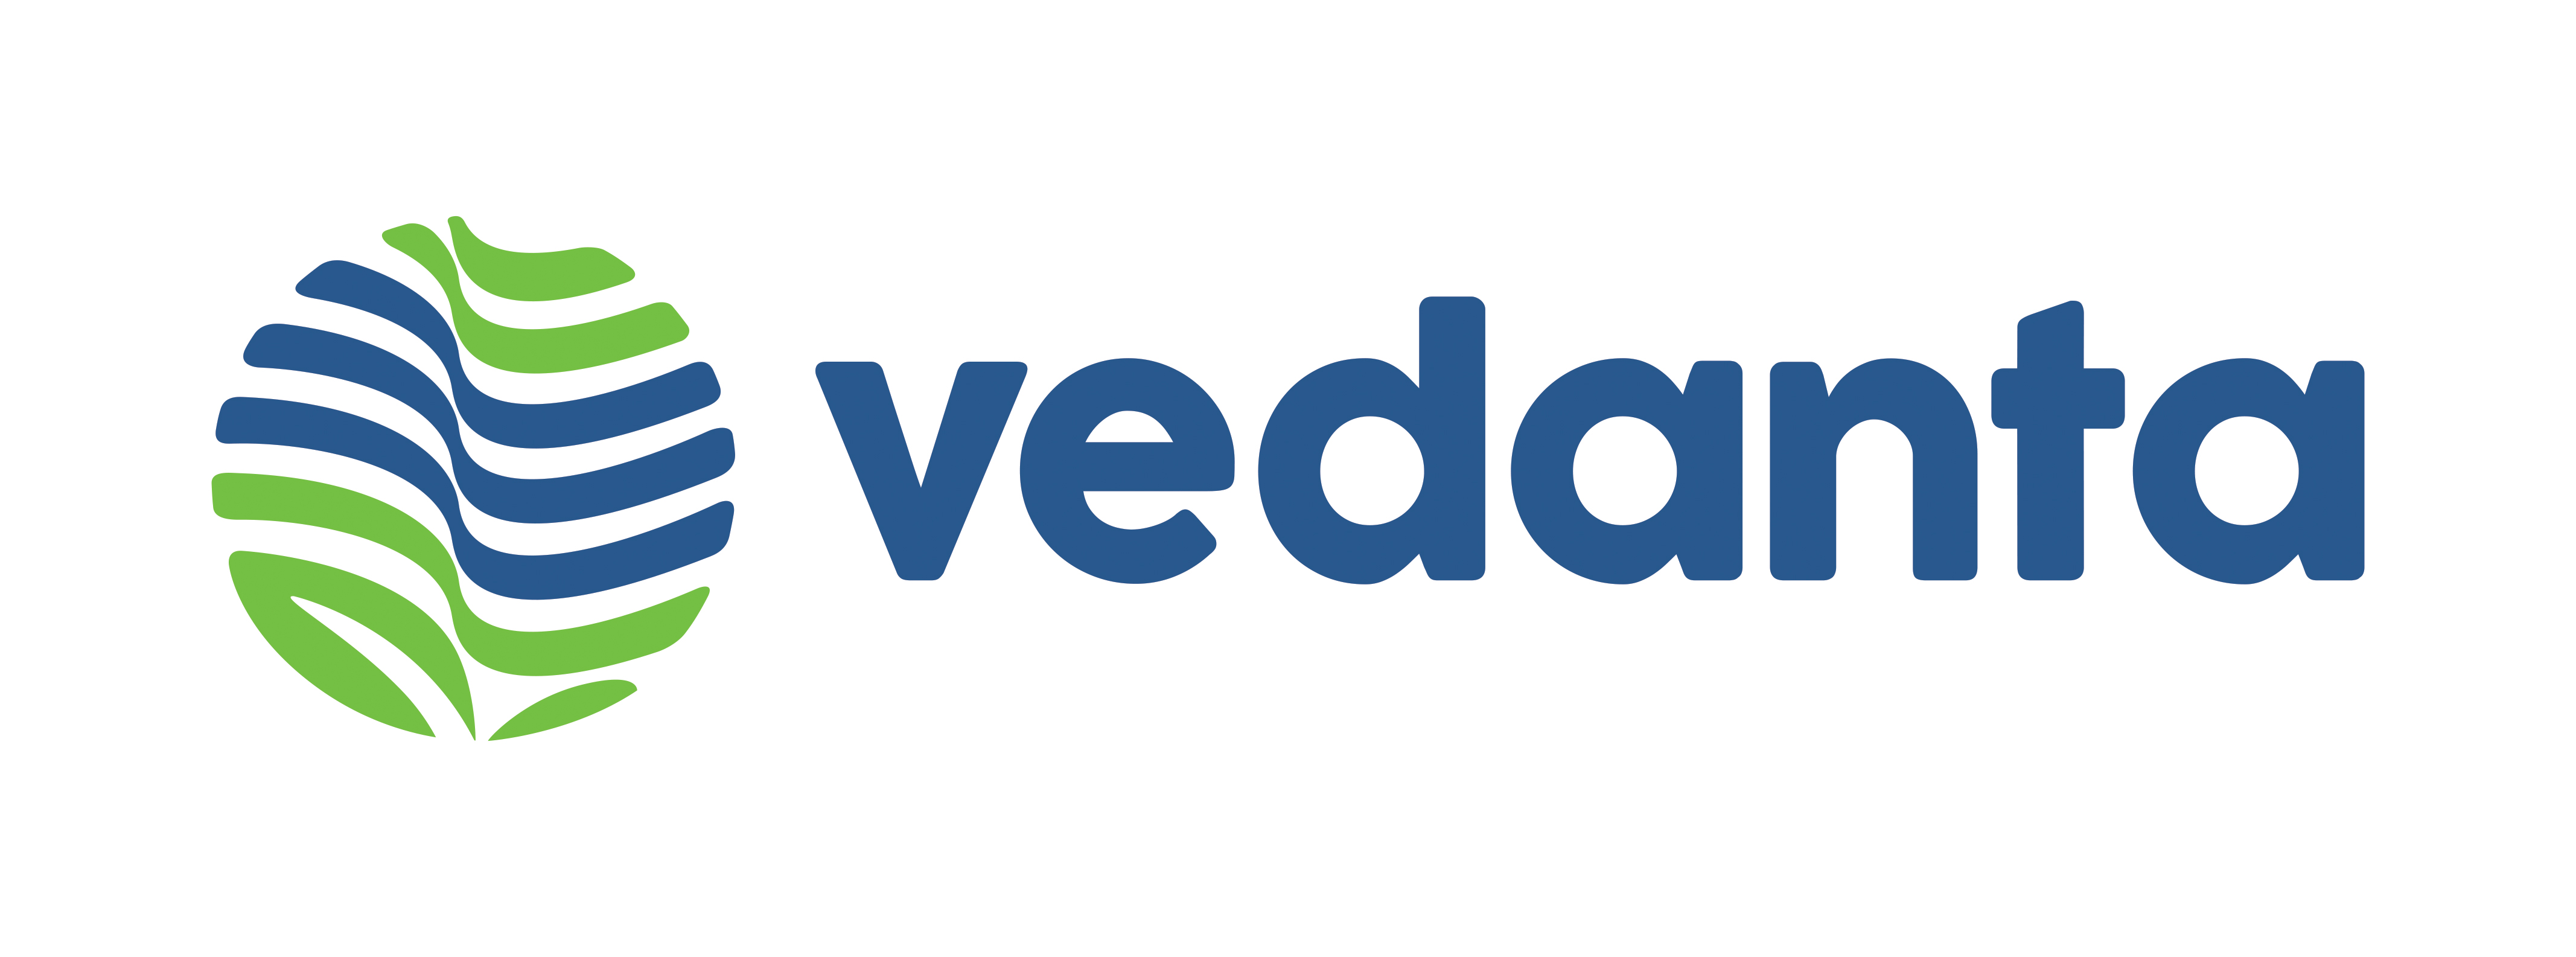 Vedanta Ltd logo